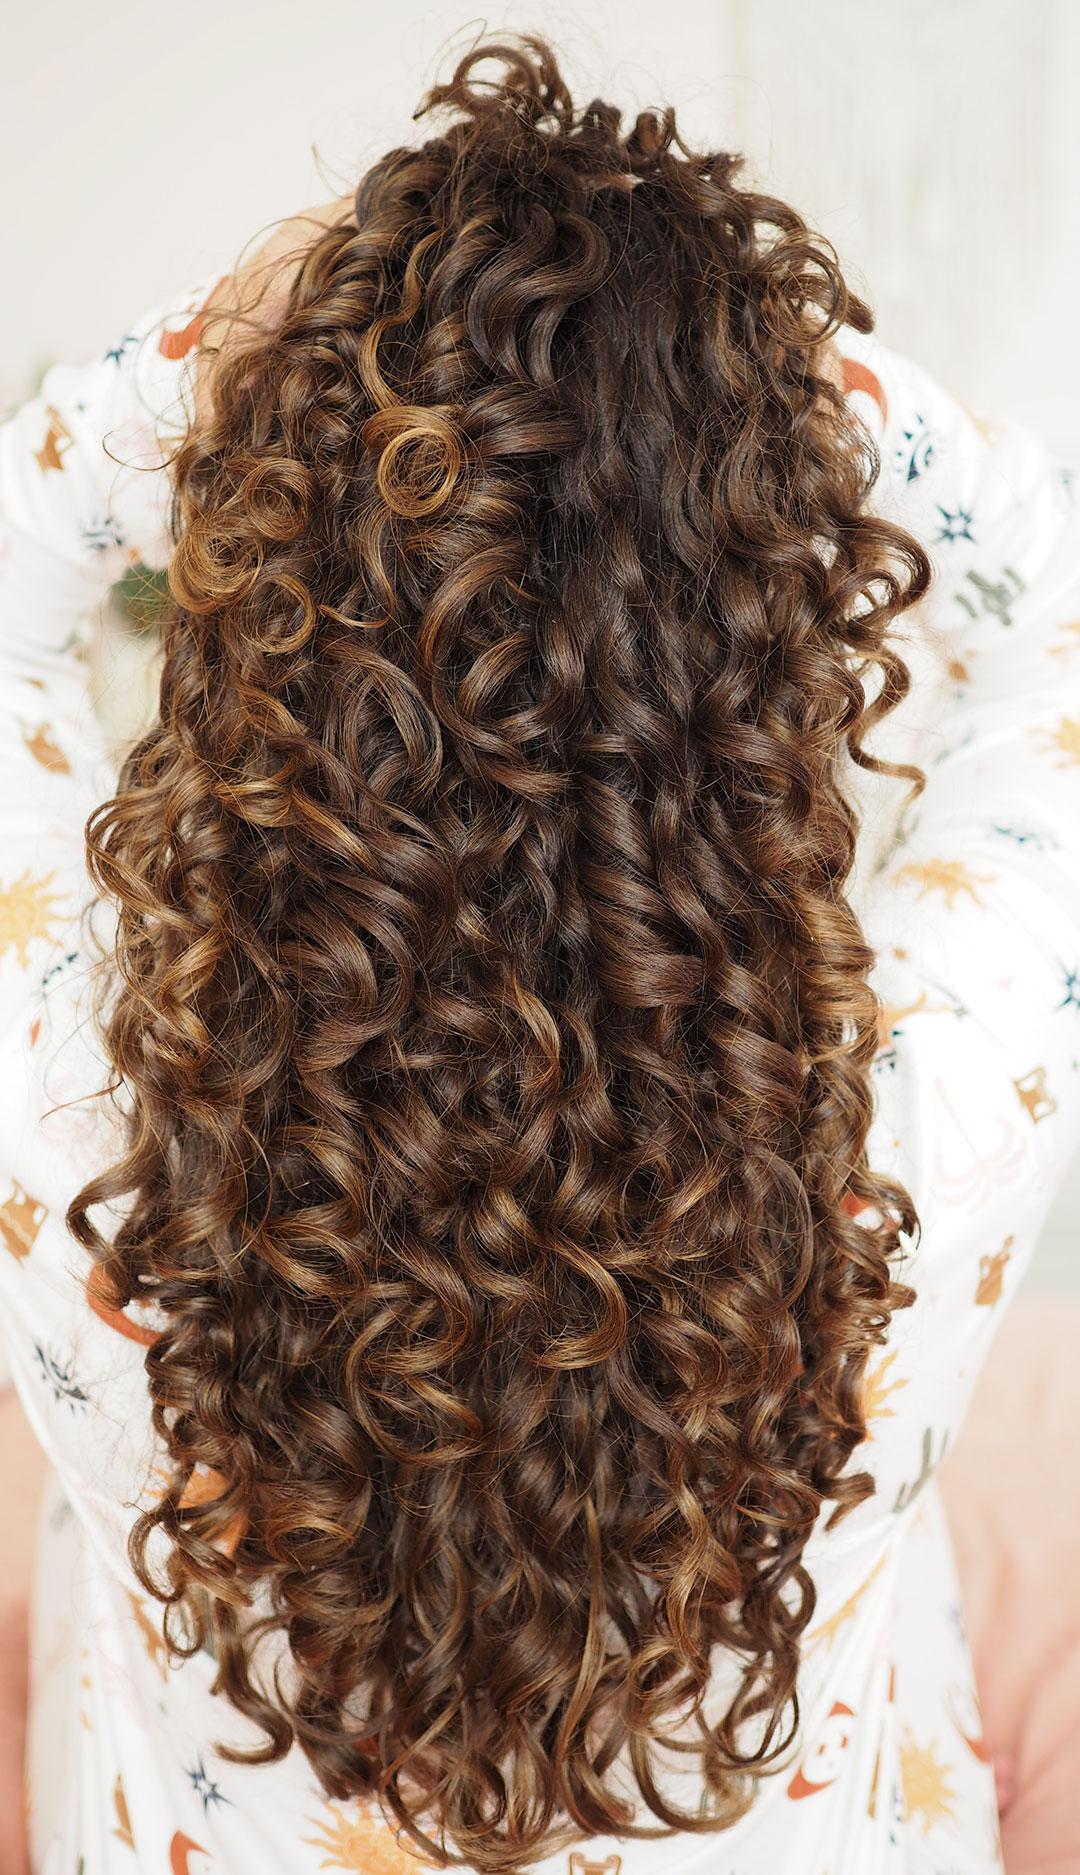 long curly hair with balayage highlights